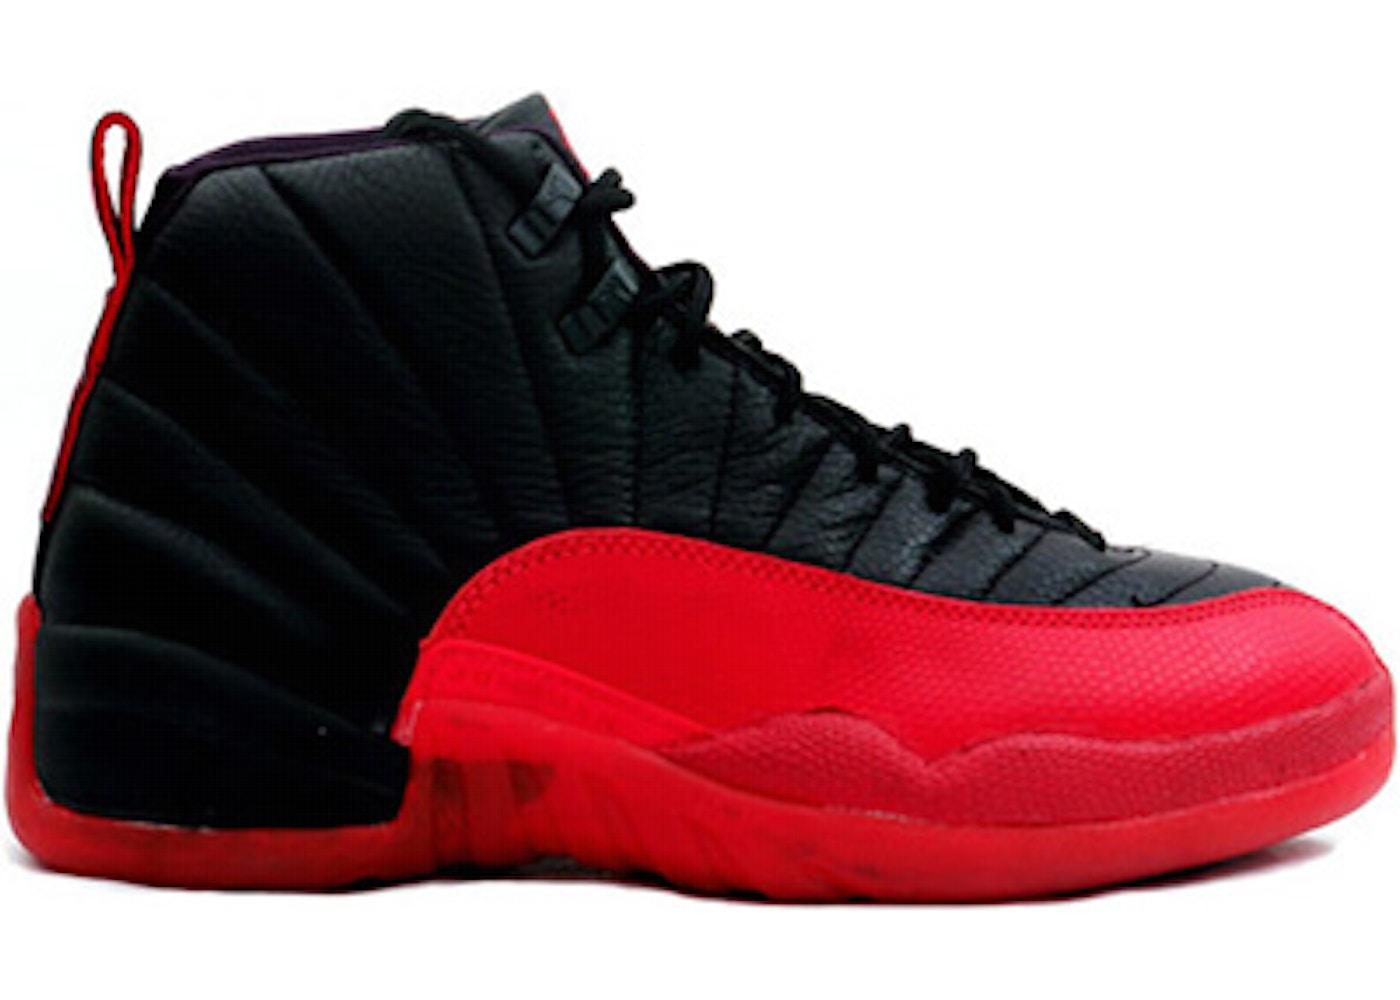 new products d4df1 f39e5 Air Jordan 12 Size 9 Shoes - Price Premium